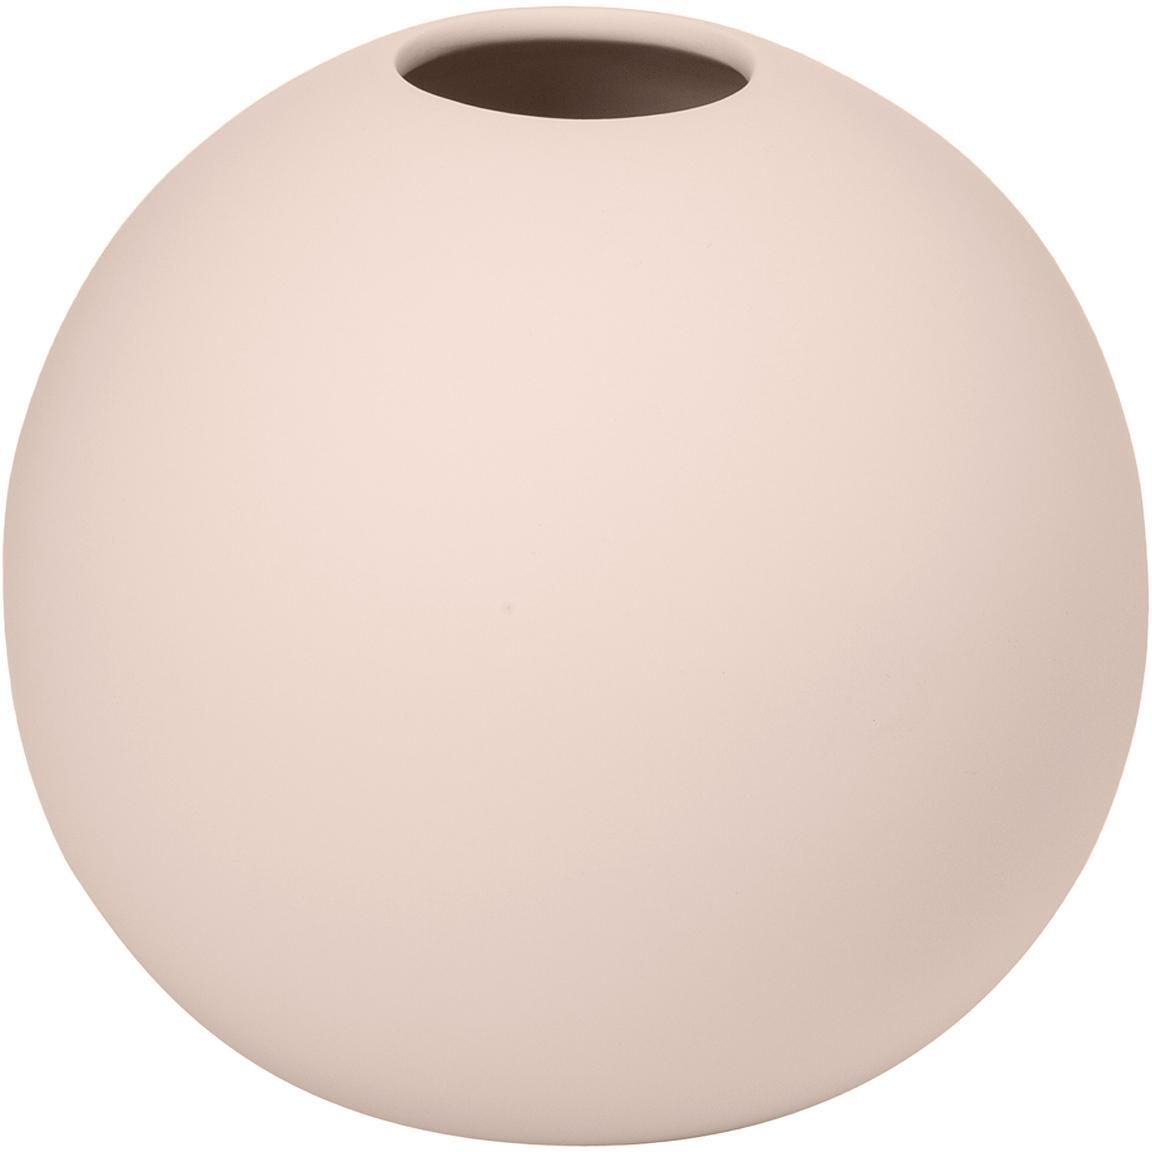 Vaso a sfera fatto a mano Ball, Ceramica, Rosa, Ø 10 x Alt. 10 cm